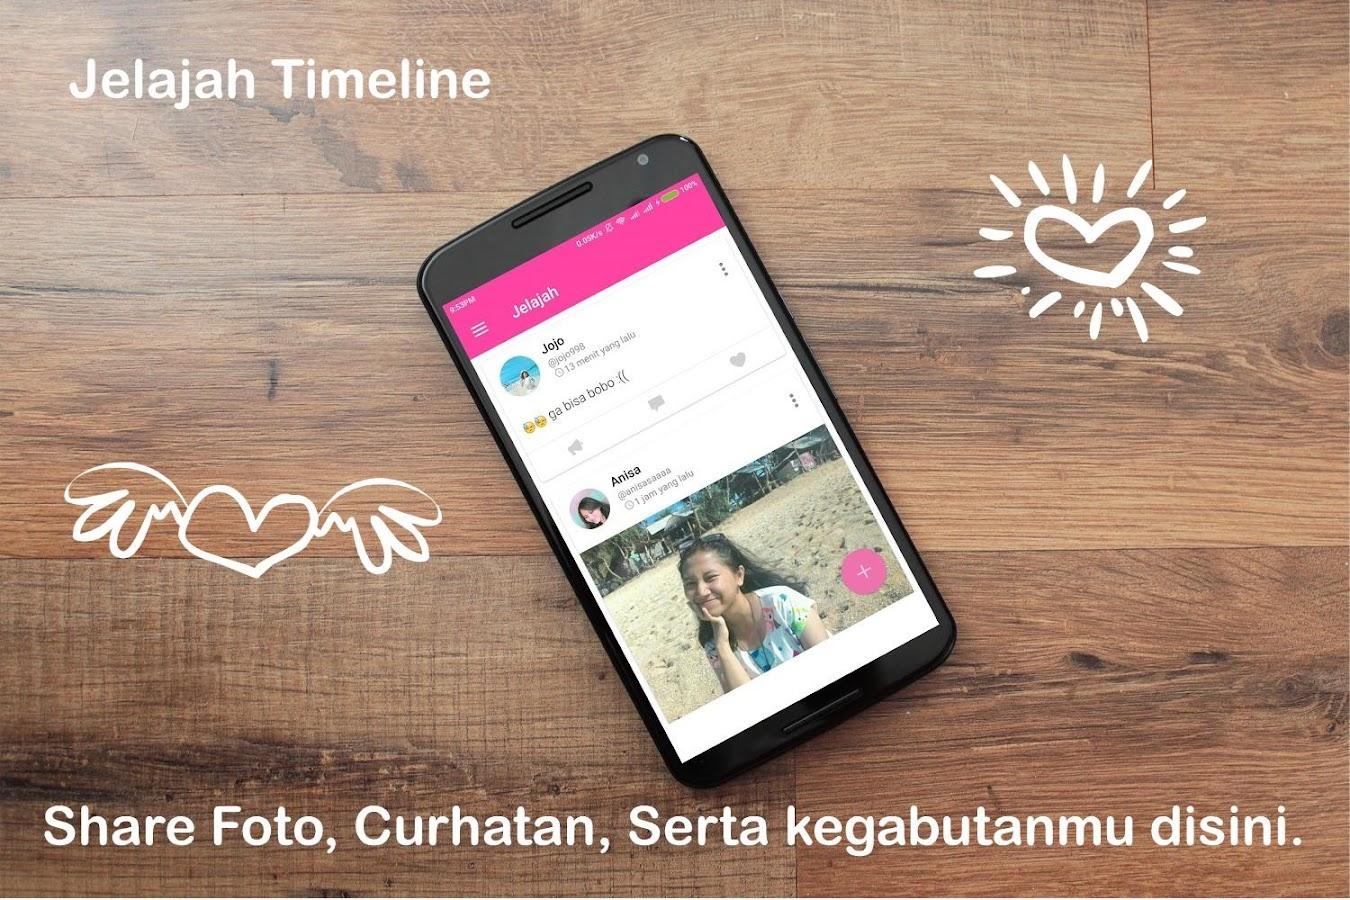 Qenalan Cari Teman Chat Android Apps On Google Play